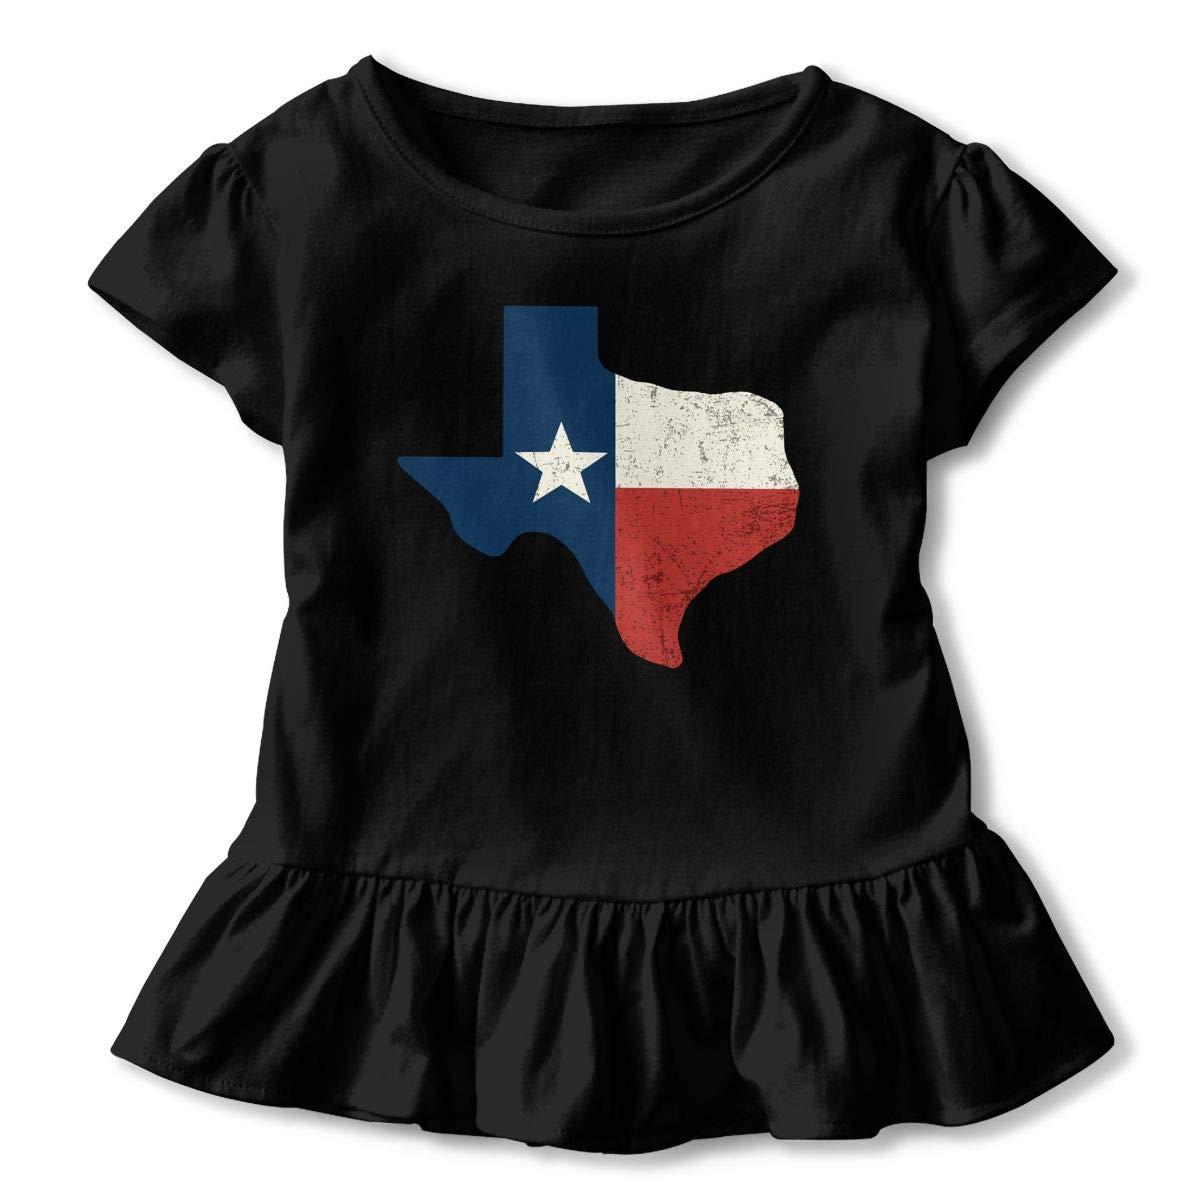 Vintage Texas Flag Toddler//Infant Girls Short Sleeve T-Shirts Ruffles Shirt Tee for 2-6T